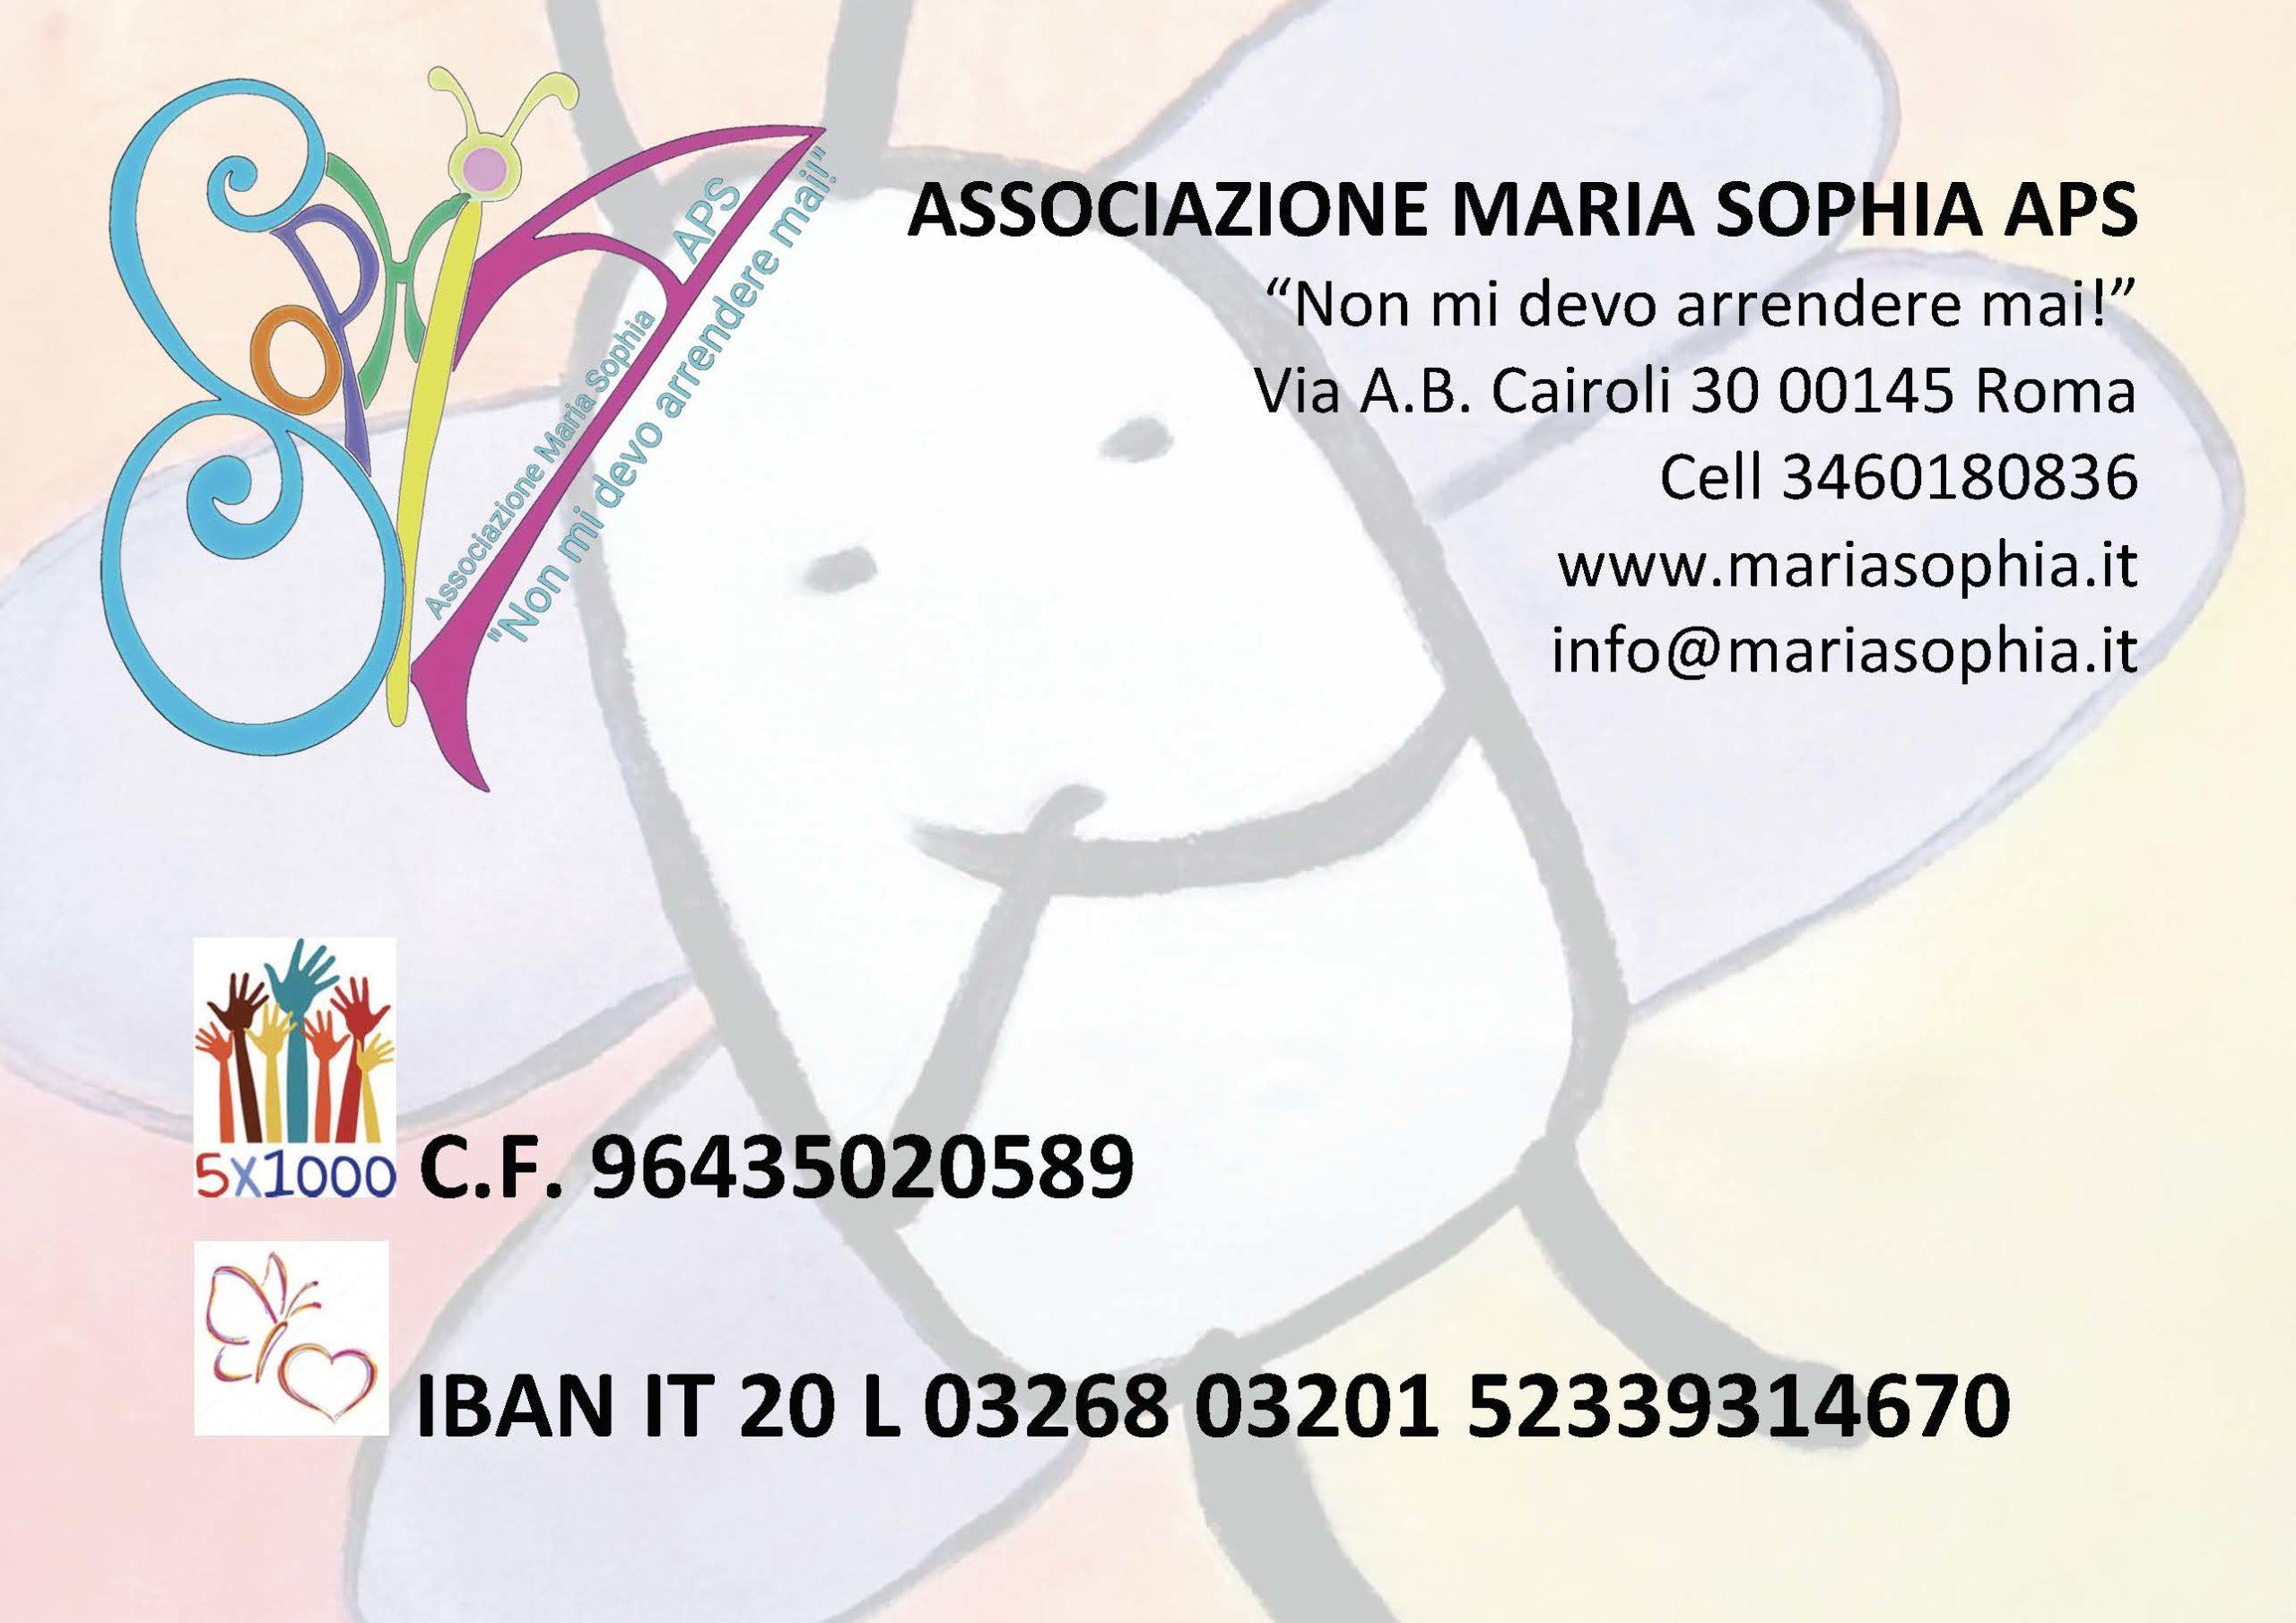 ASSOCIAZIONE MARIA SOPHIA APS_Pagina_1